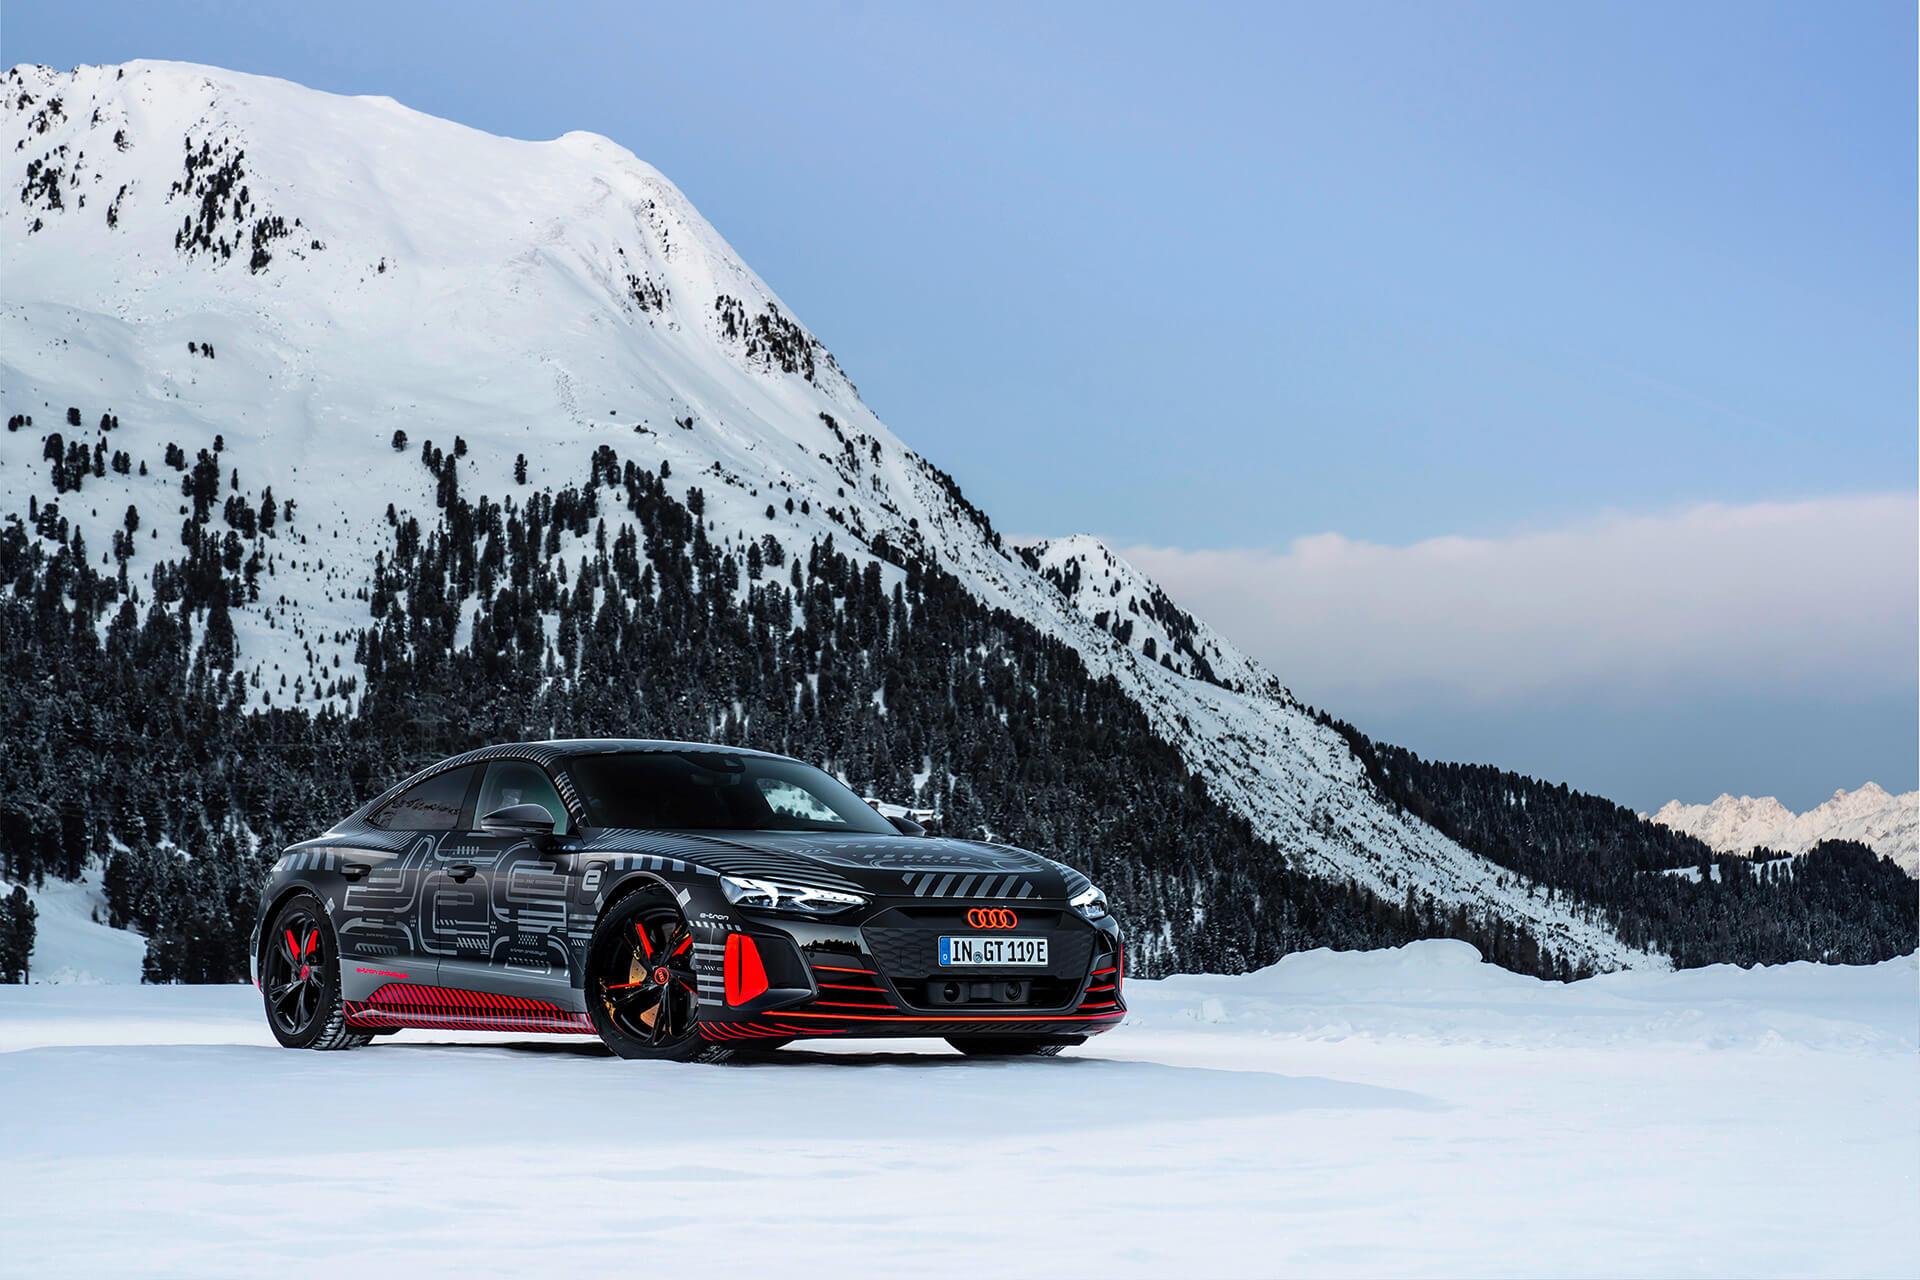 Audi e-tron GT - Εμπρός όψη, σε χιονισμένο τοπίο